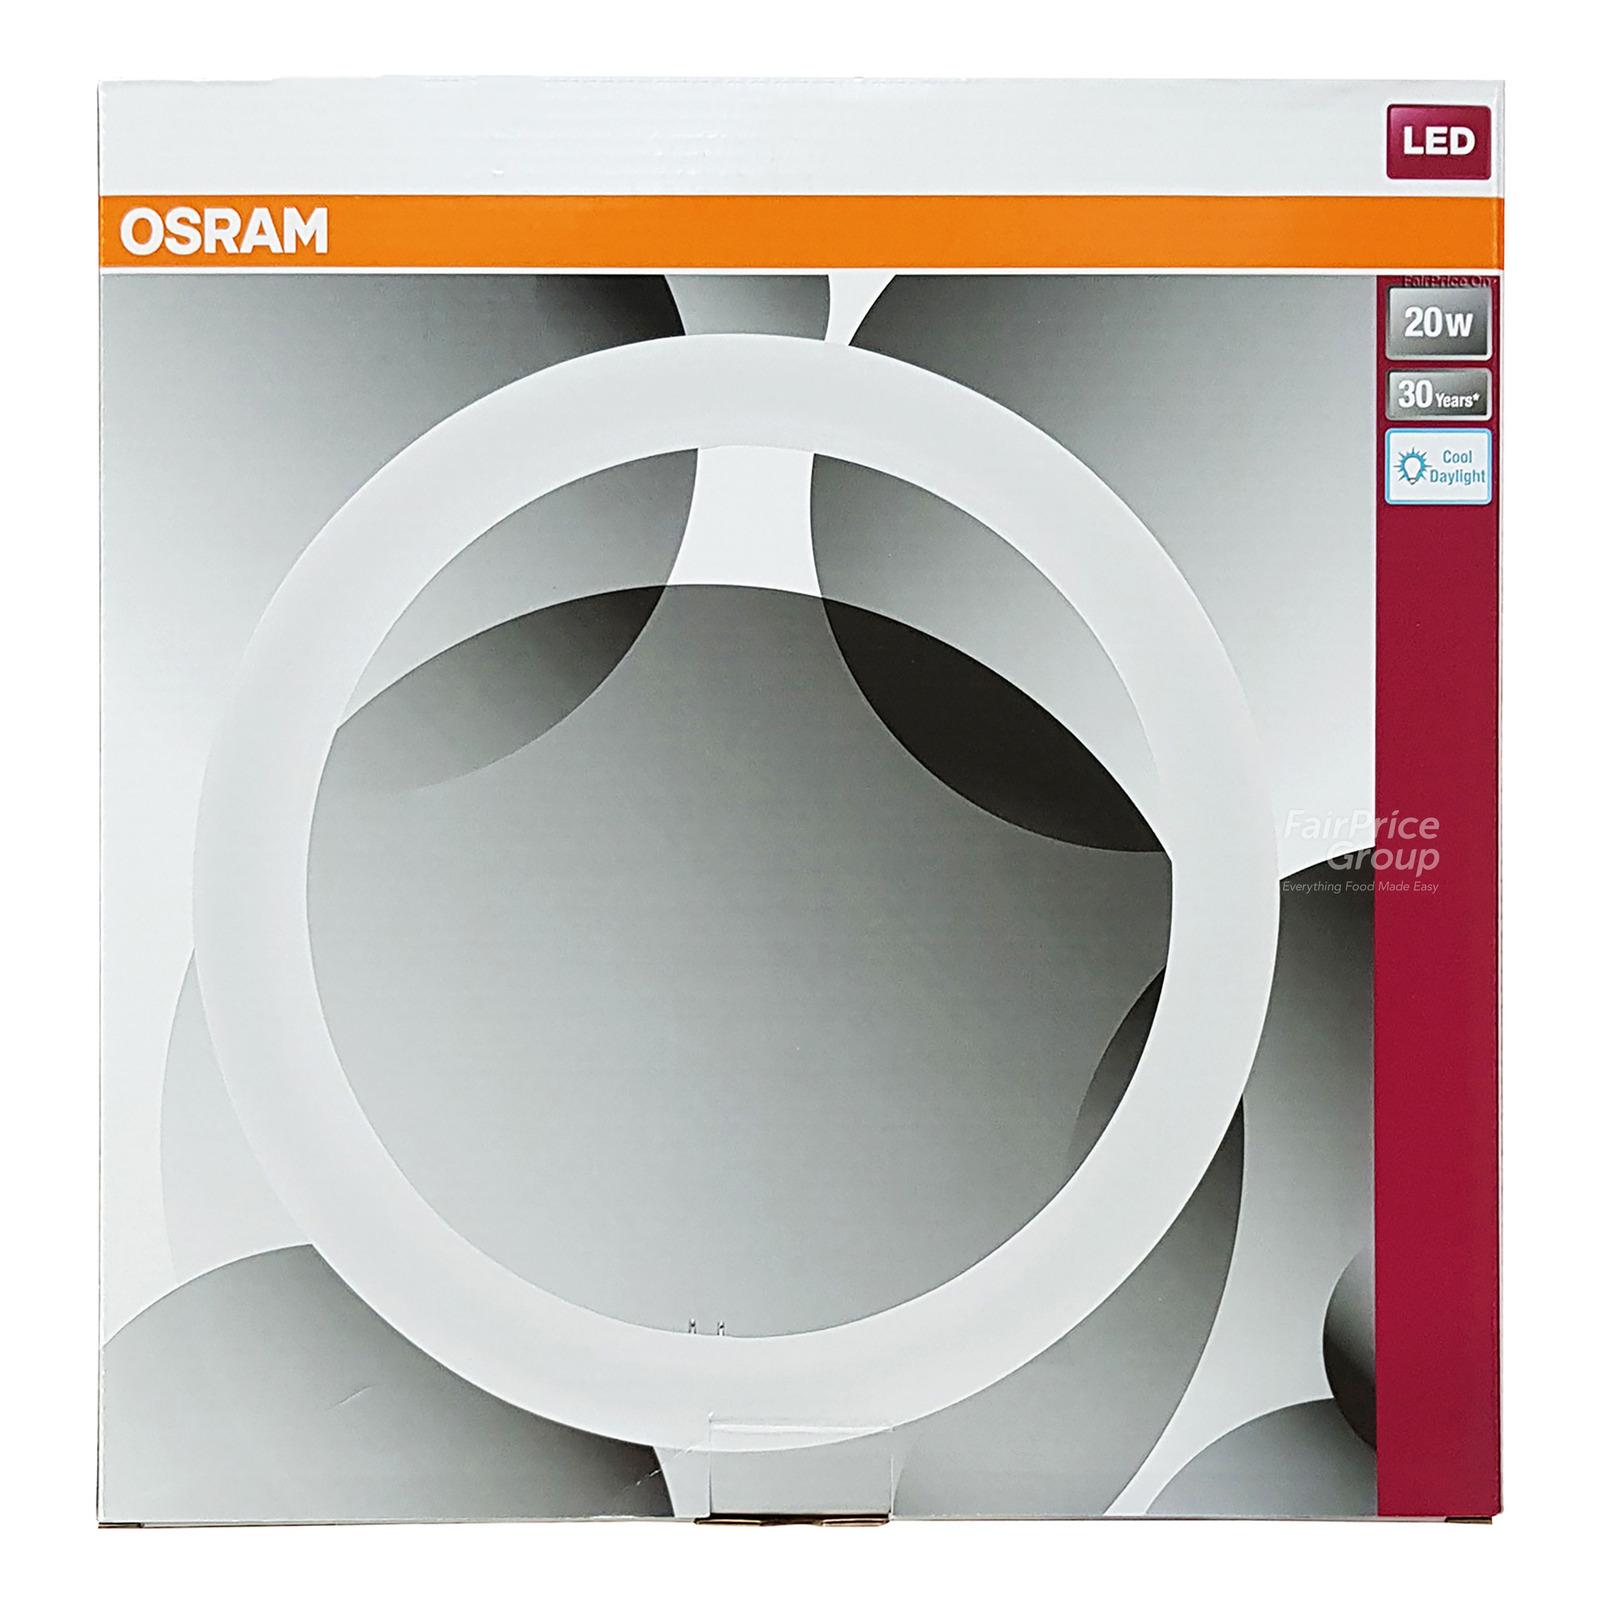 Osram LED Circular Fluorescent Lamp - Cool Daylight (20 W)